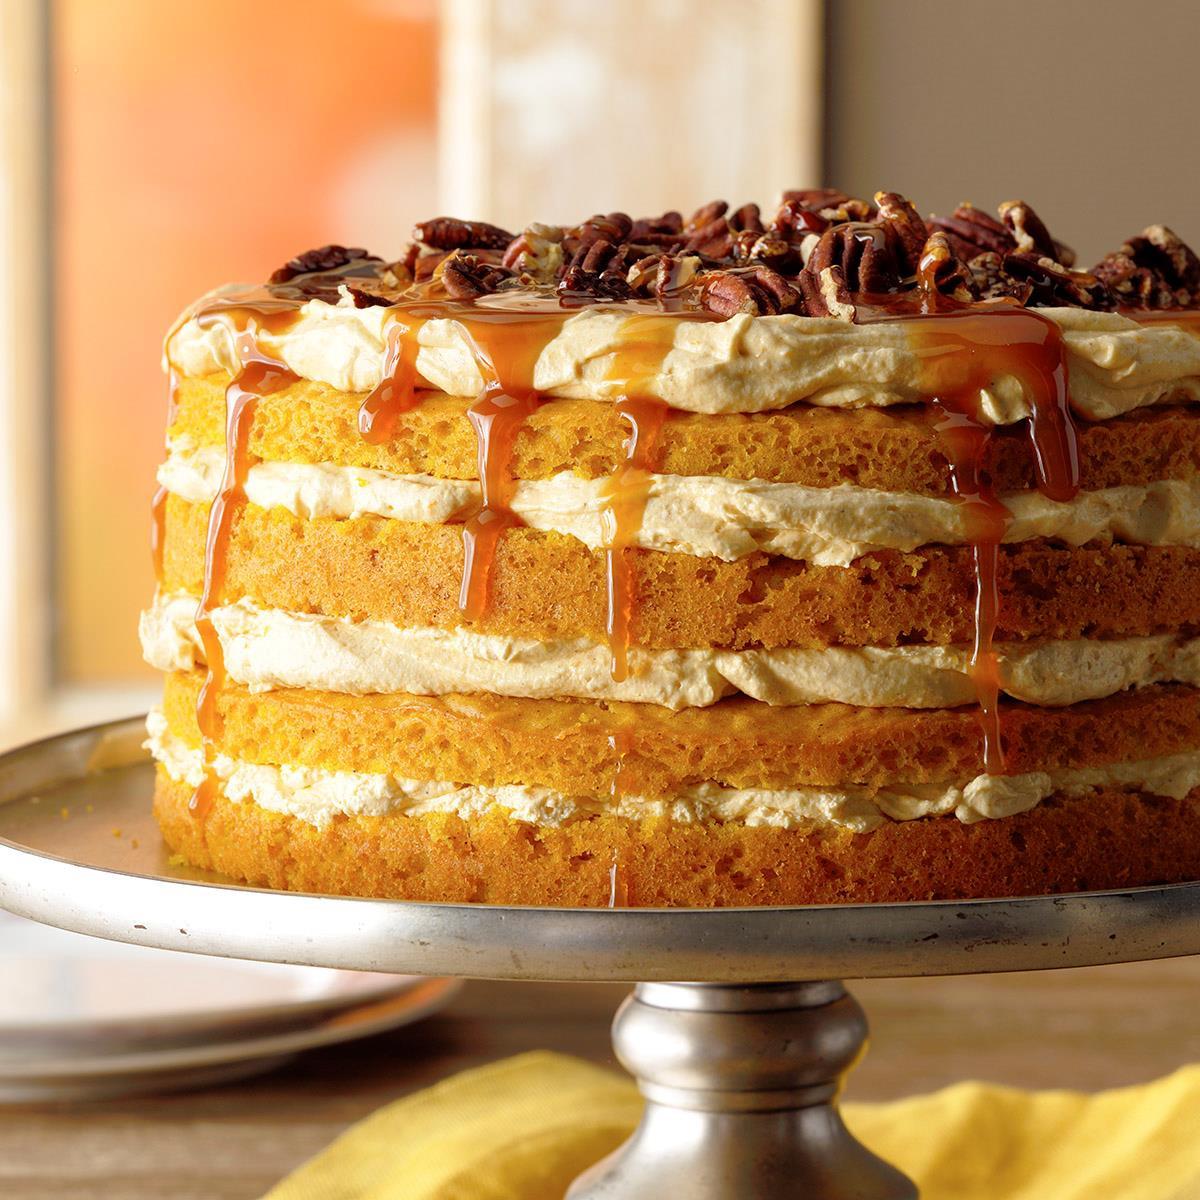 Fall Dessert Ideas  Impressive Thanksgiving Desserts You Gotta Try This Year